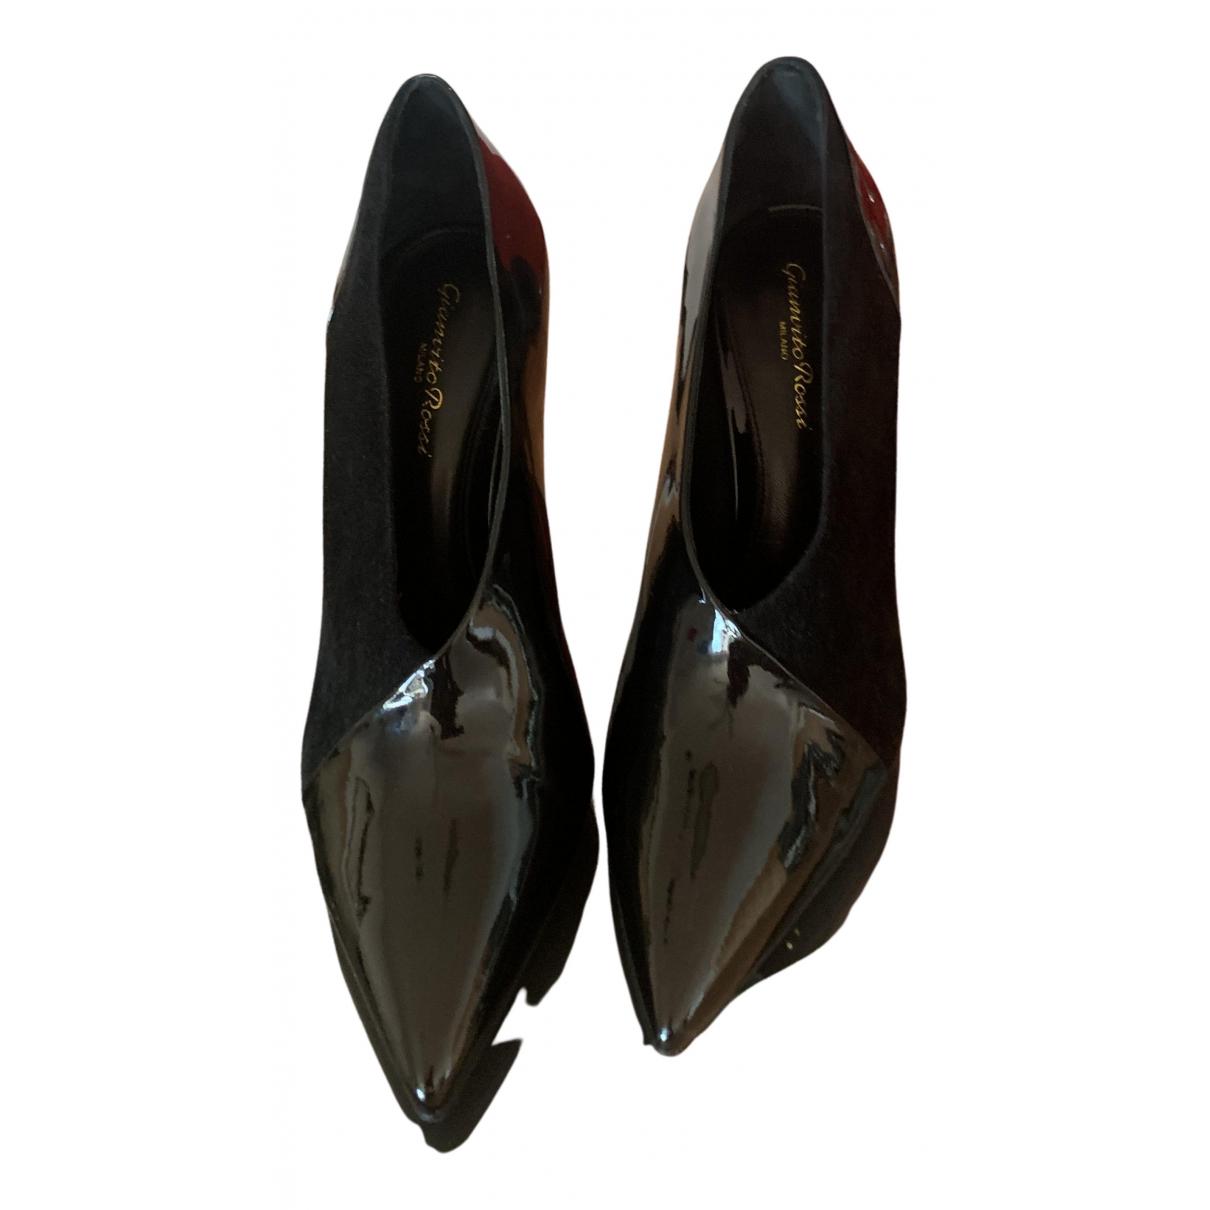 Gianvito Rossi - Escarpins   pour femme en cuir verni - noir